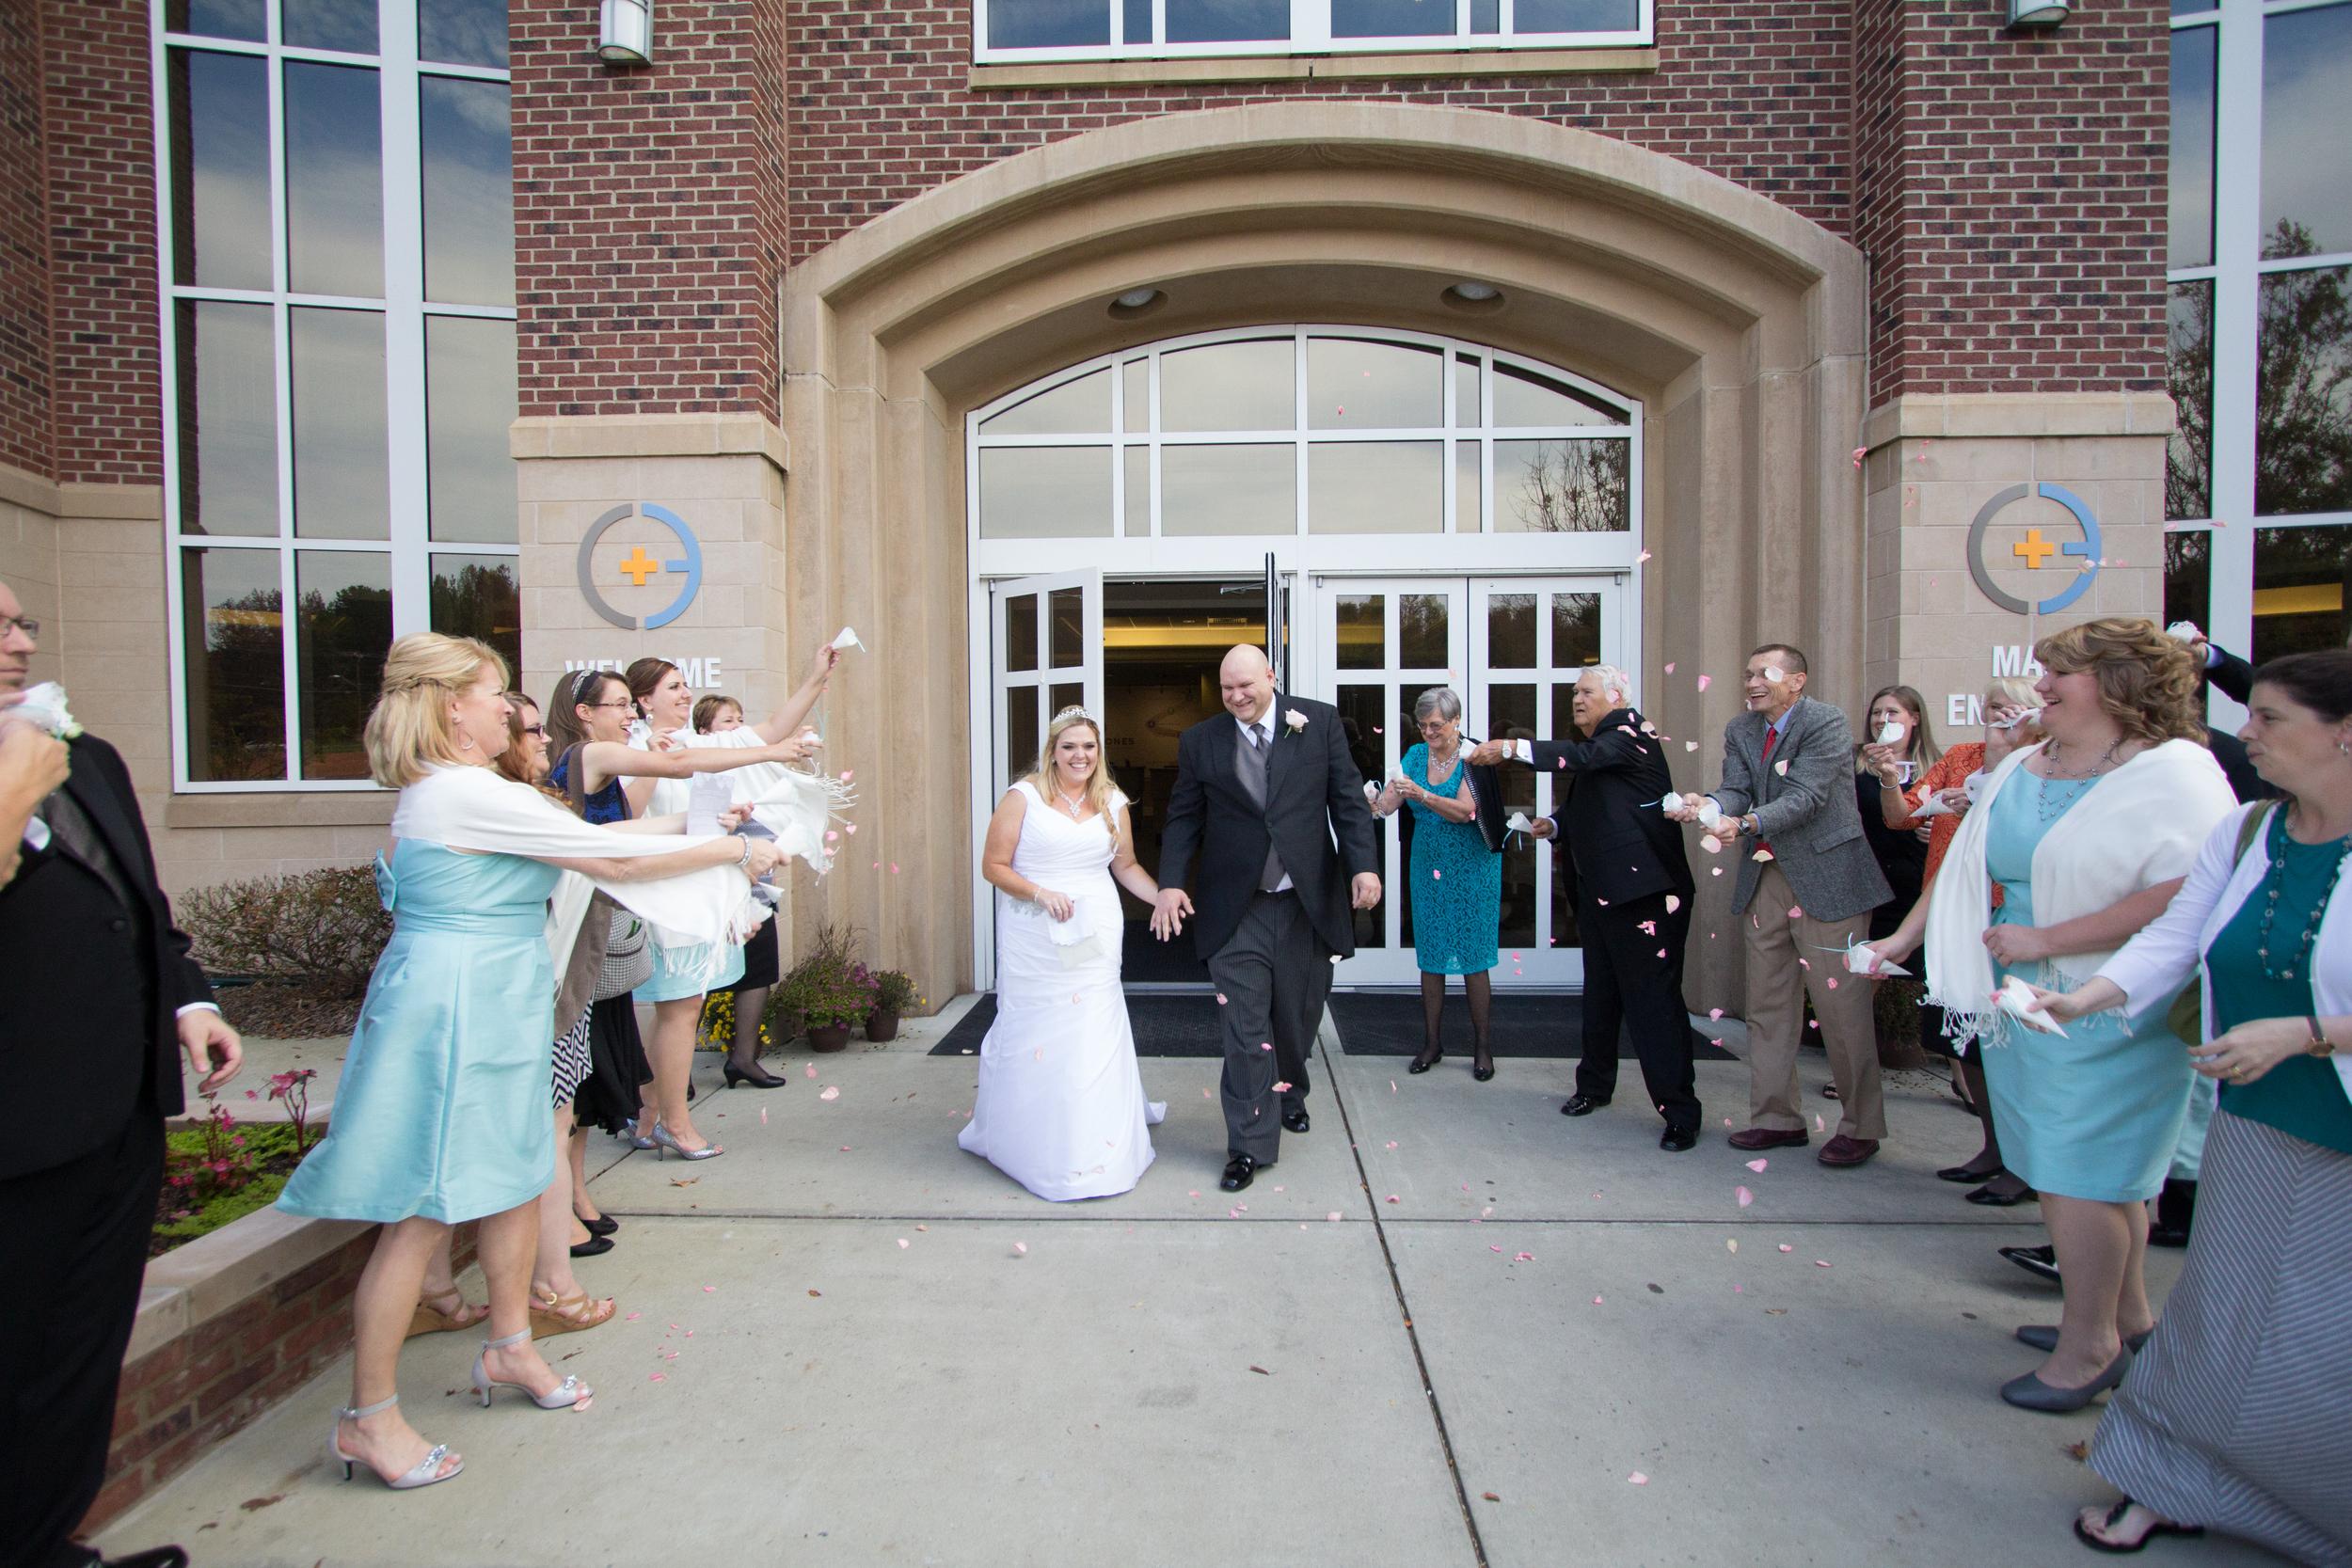 Hough_Wedding_North_Carolina_Charlotte_JonCourvillePhotography-557.jpg